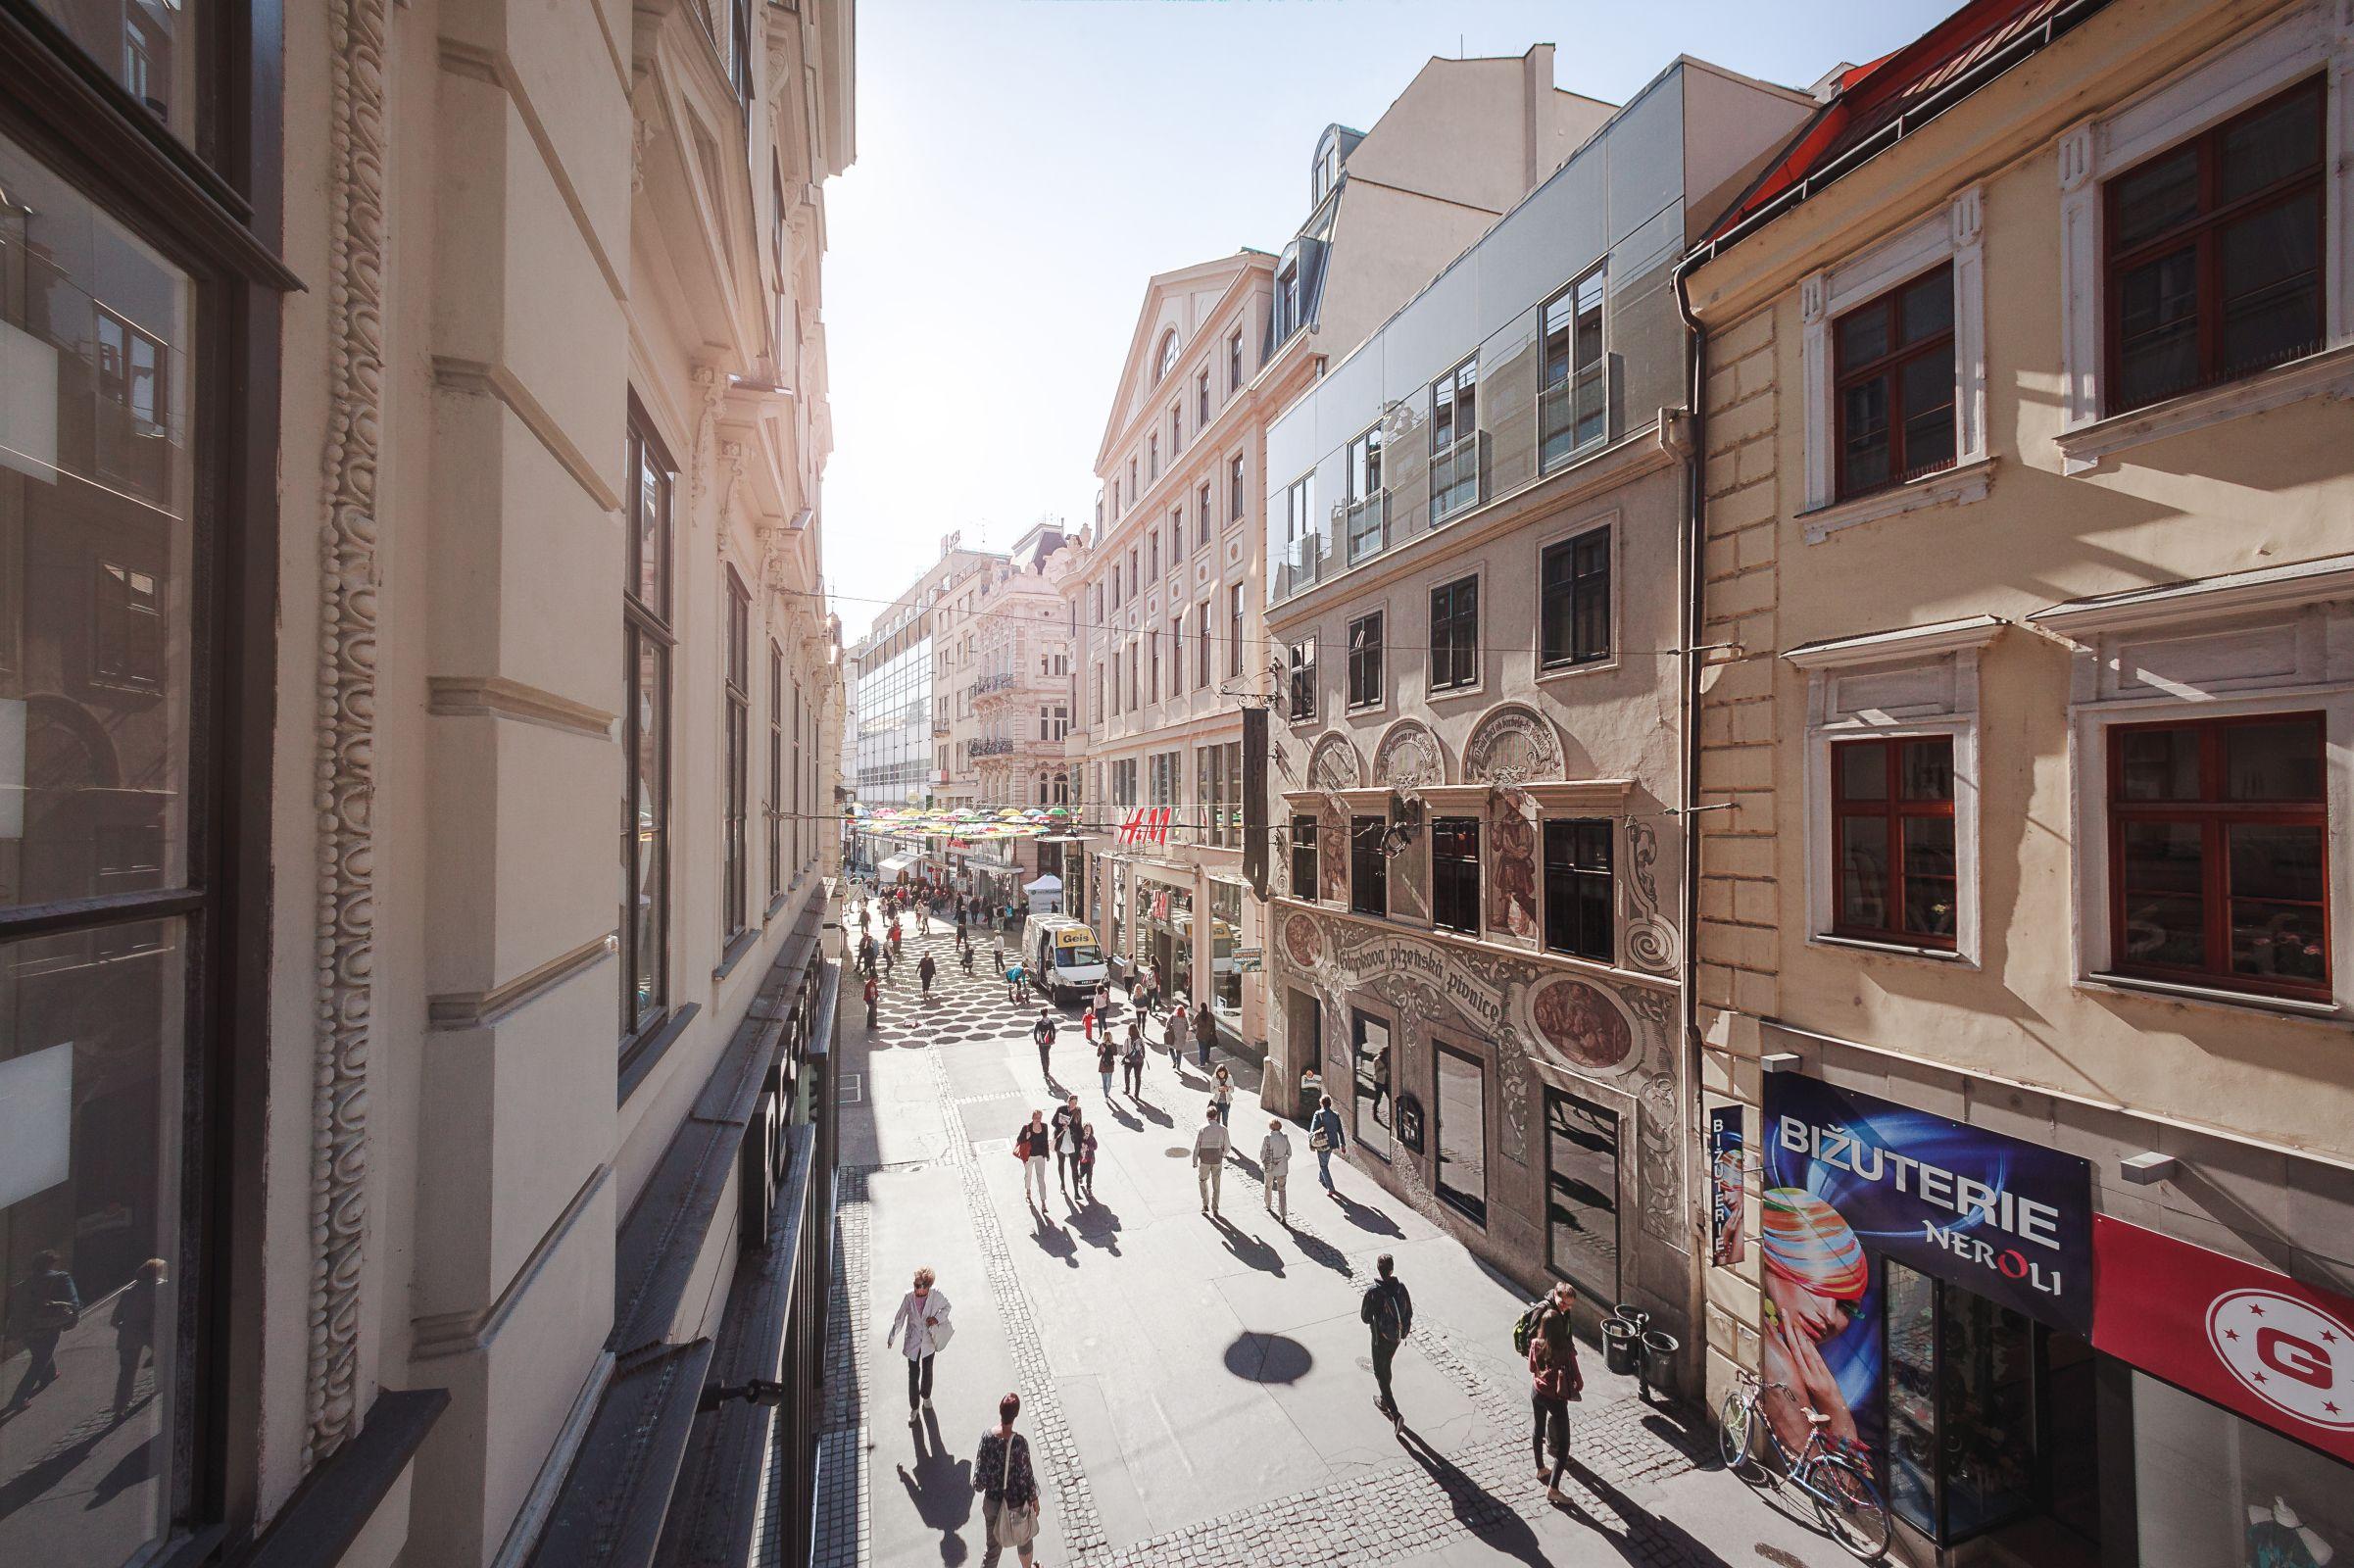 Česká street in Brno